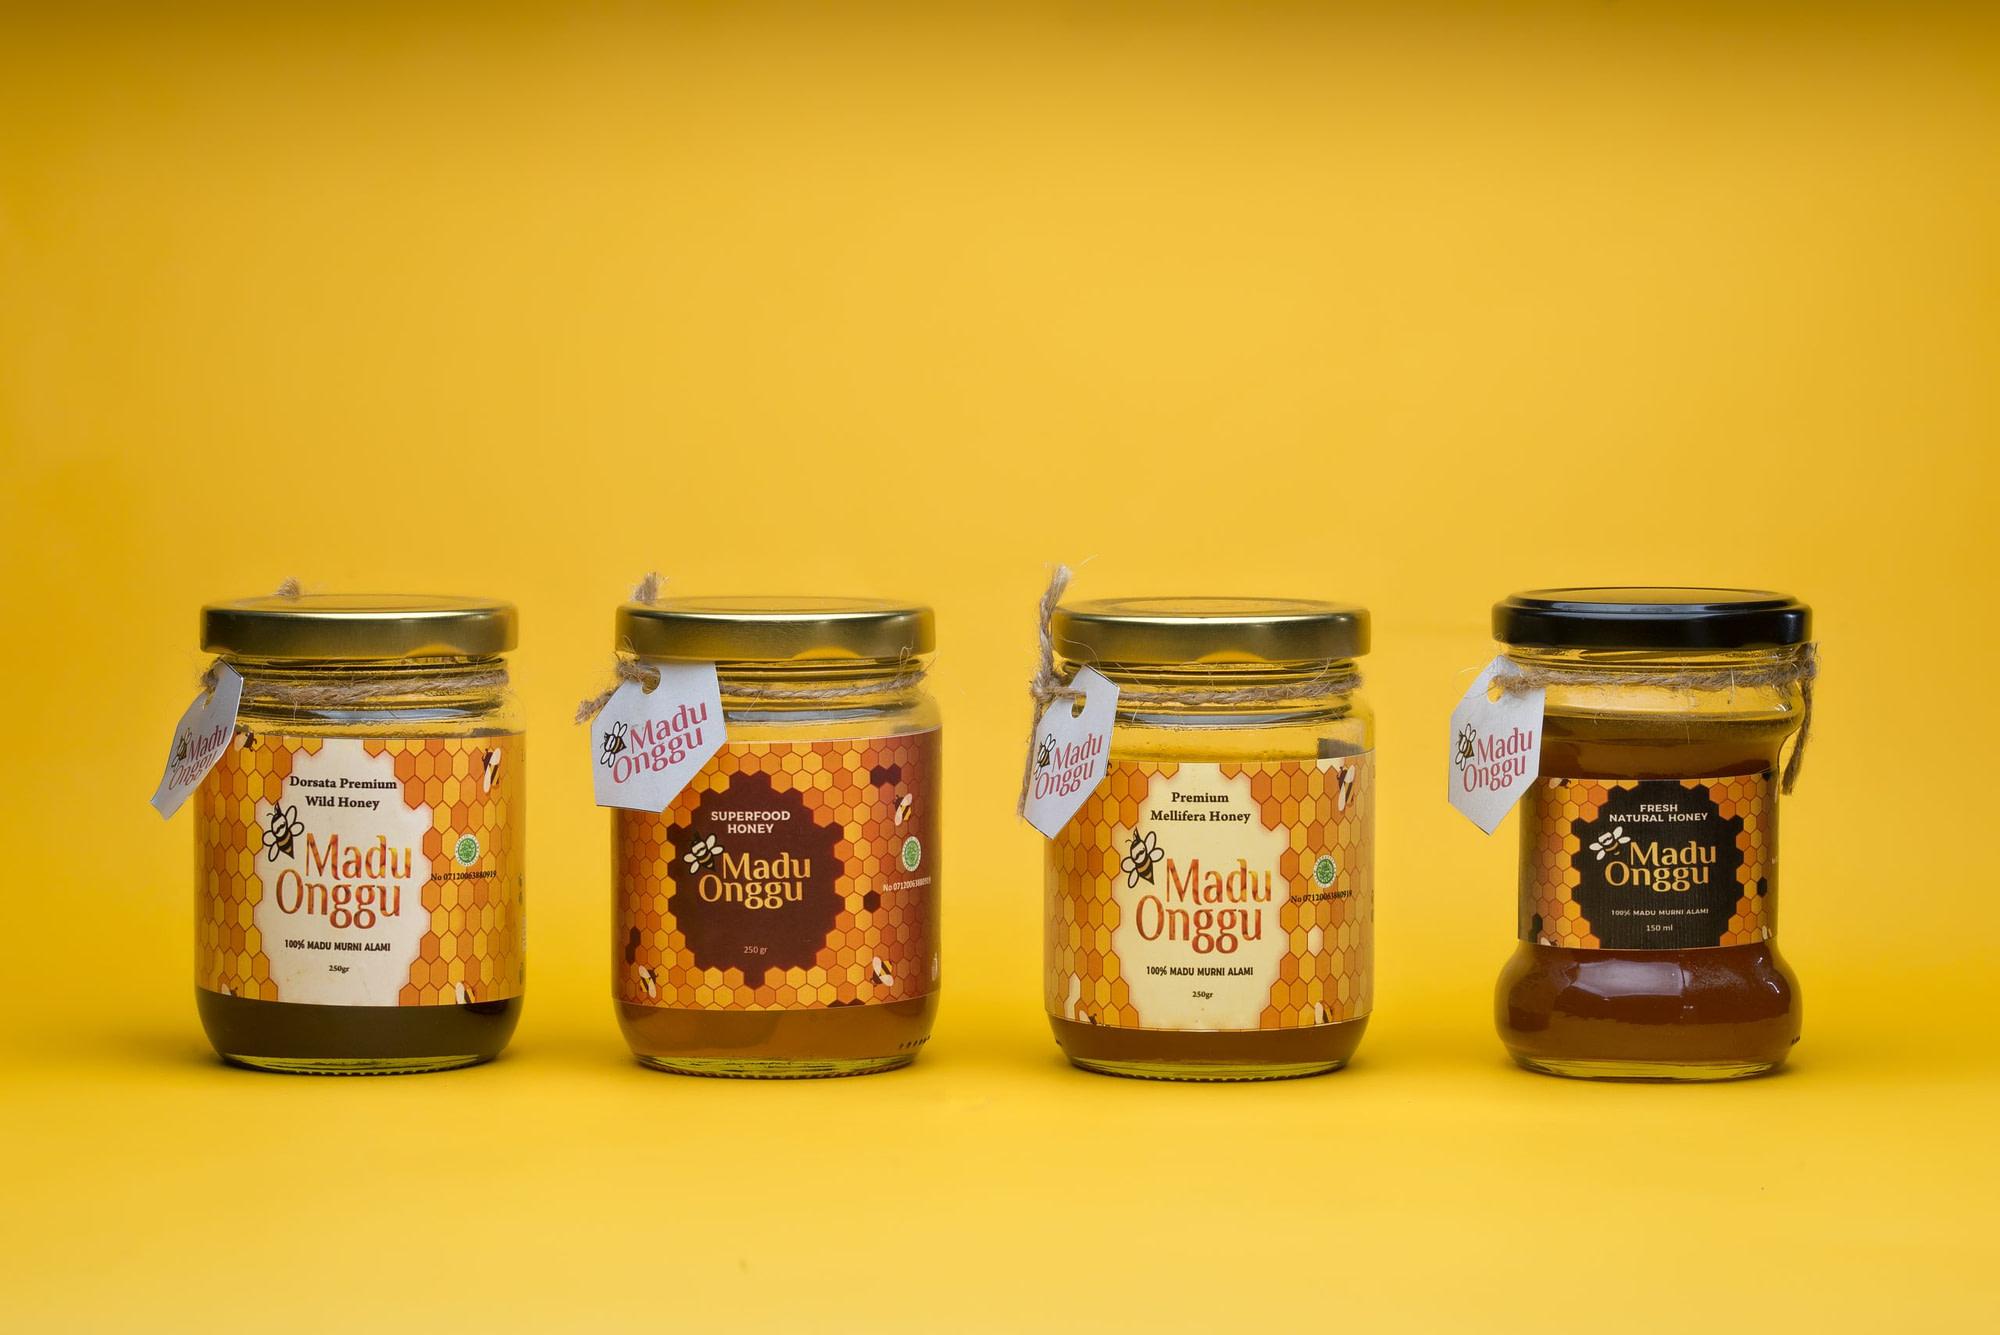 produk madu onggu tahun 2020